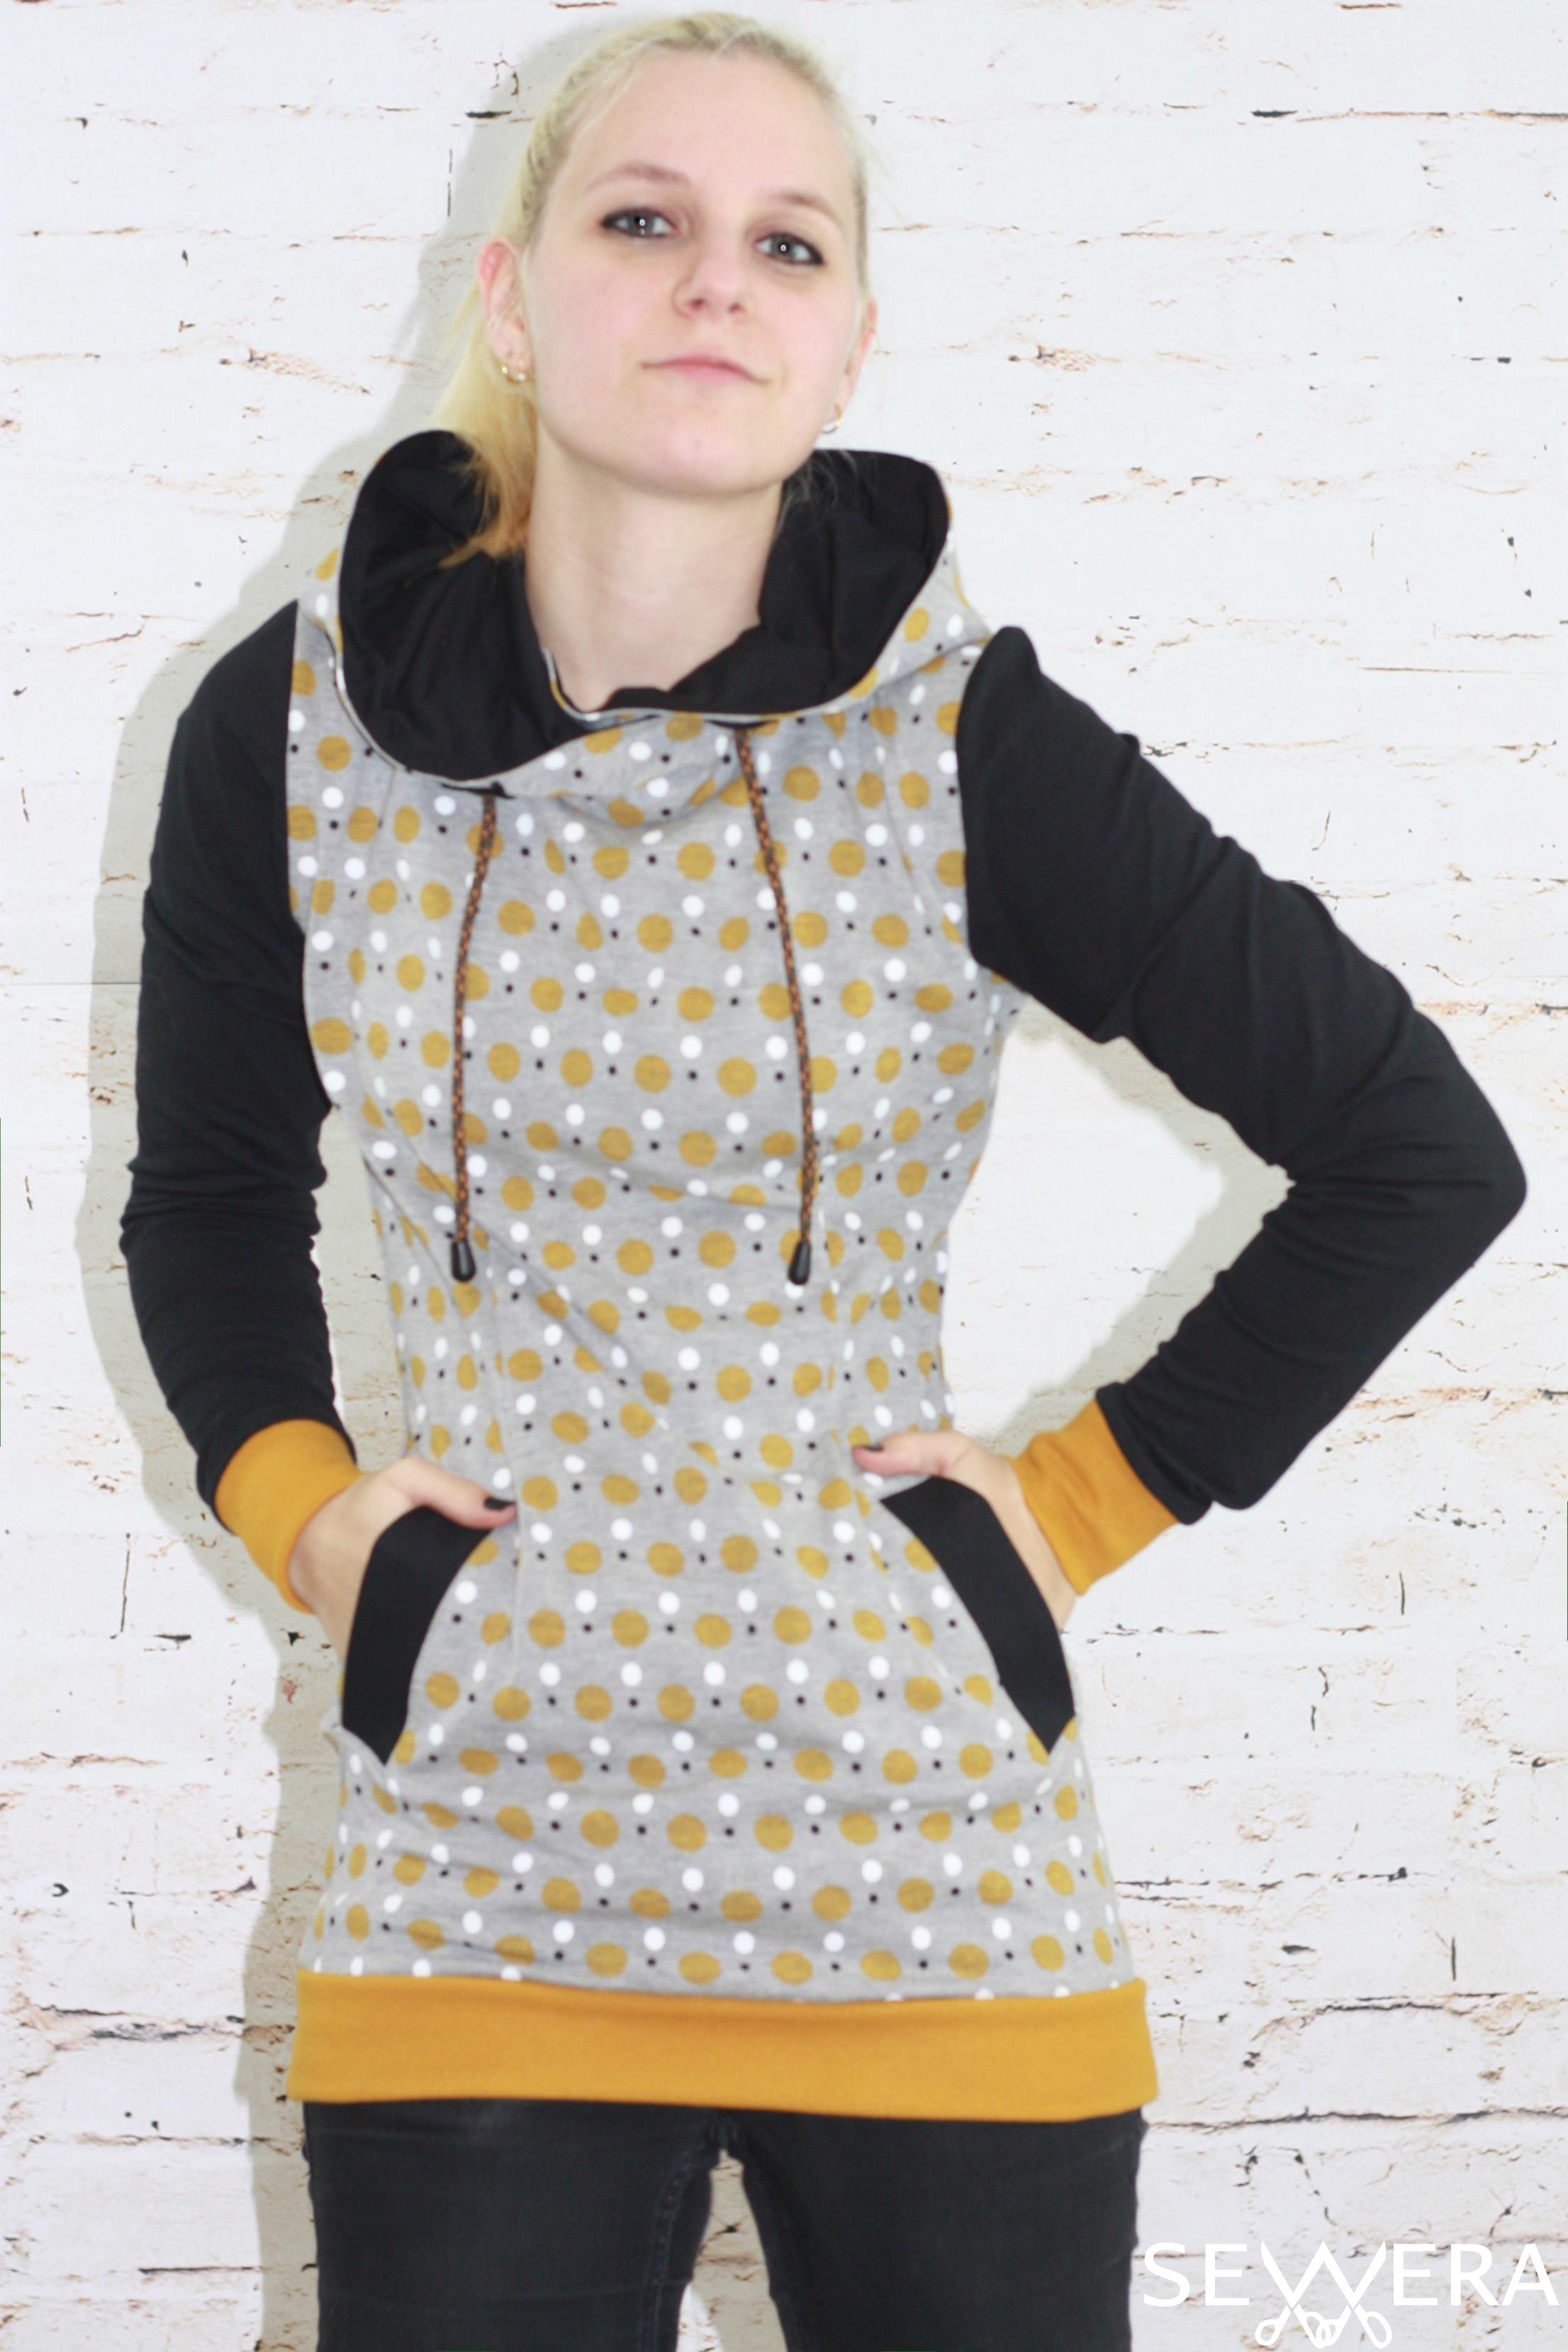 Jpg Damen Fashion Kapuzenpullover Sewera Schnittmuster Vmn8w0n DYW29eEIHb